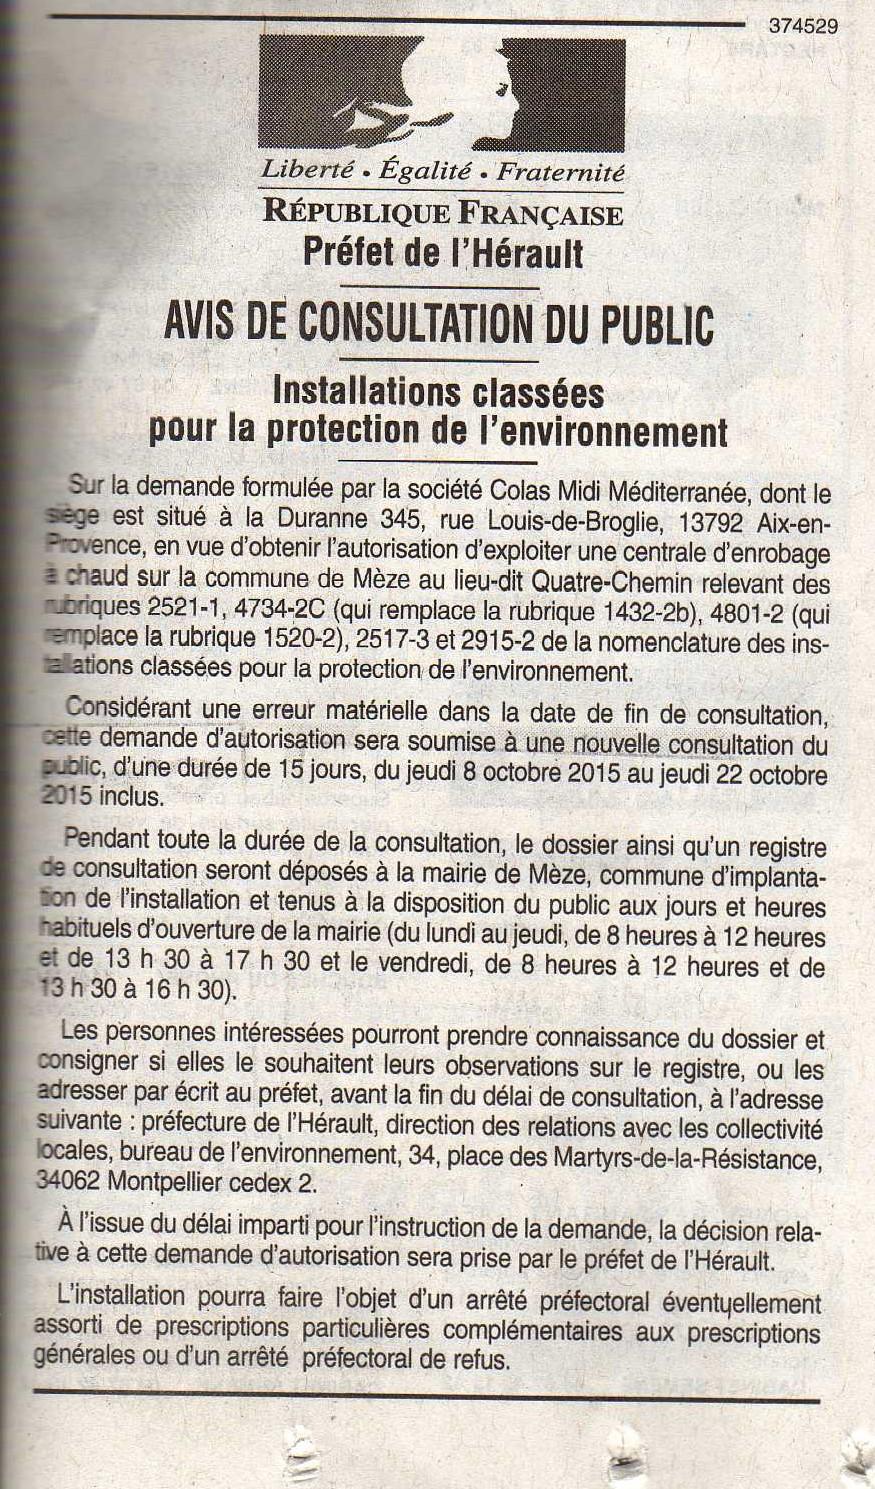 avis consultation 2 usine enrobe à chaud001.jpg